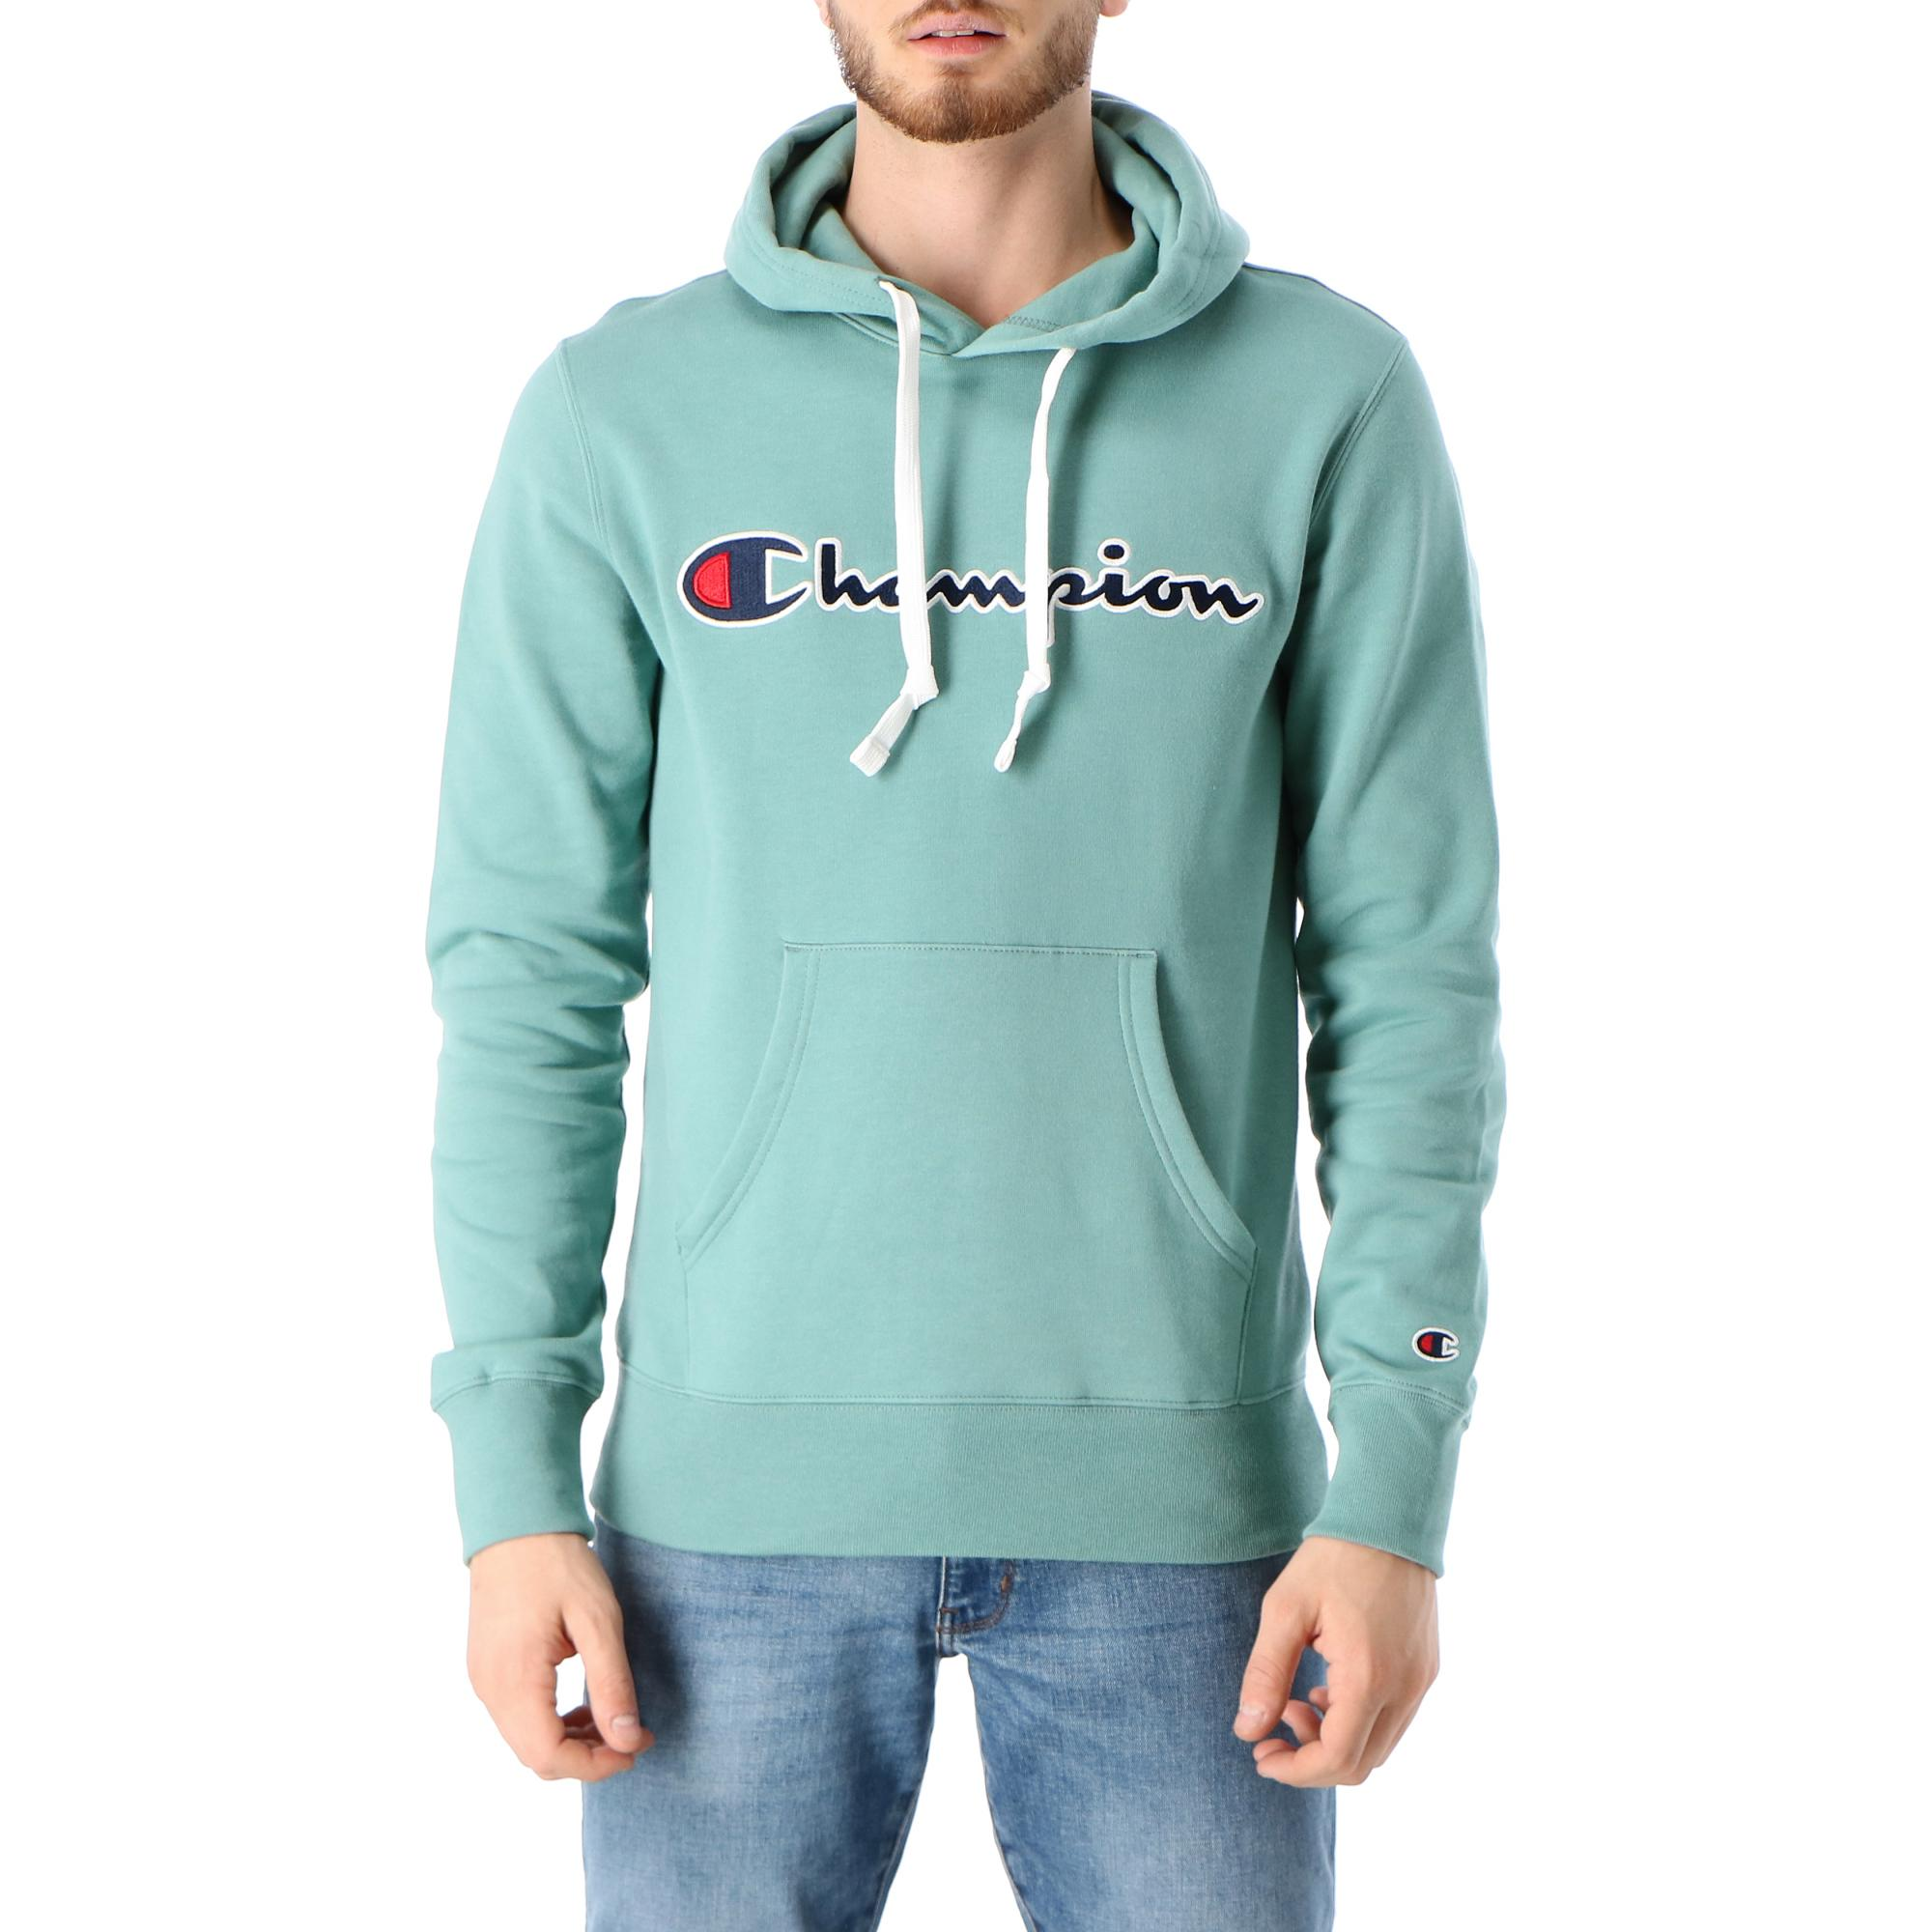 Champion Hooded Sweatshirt Green pastel